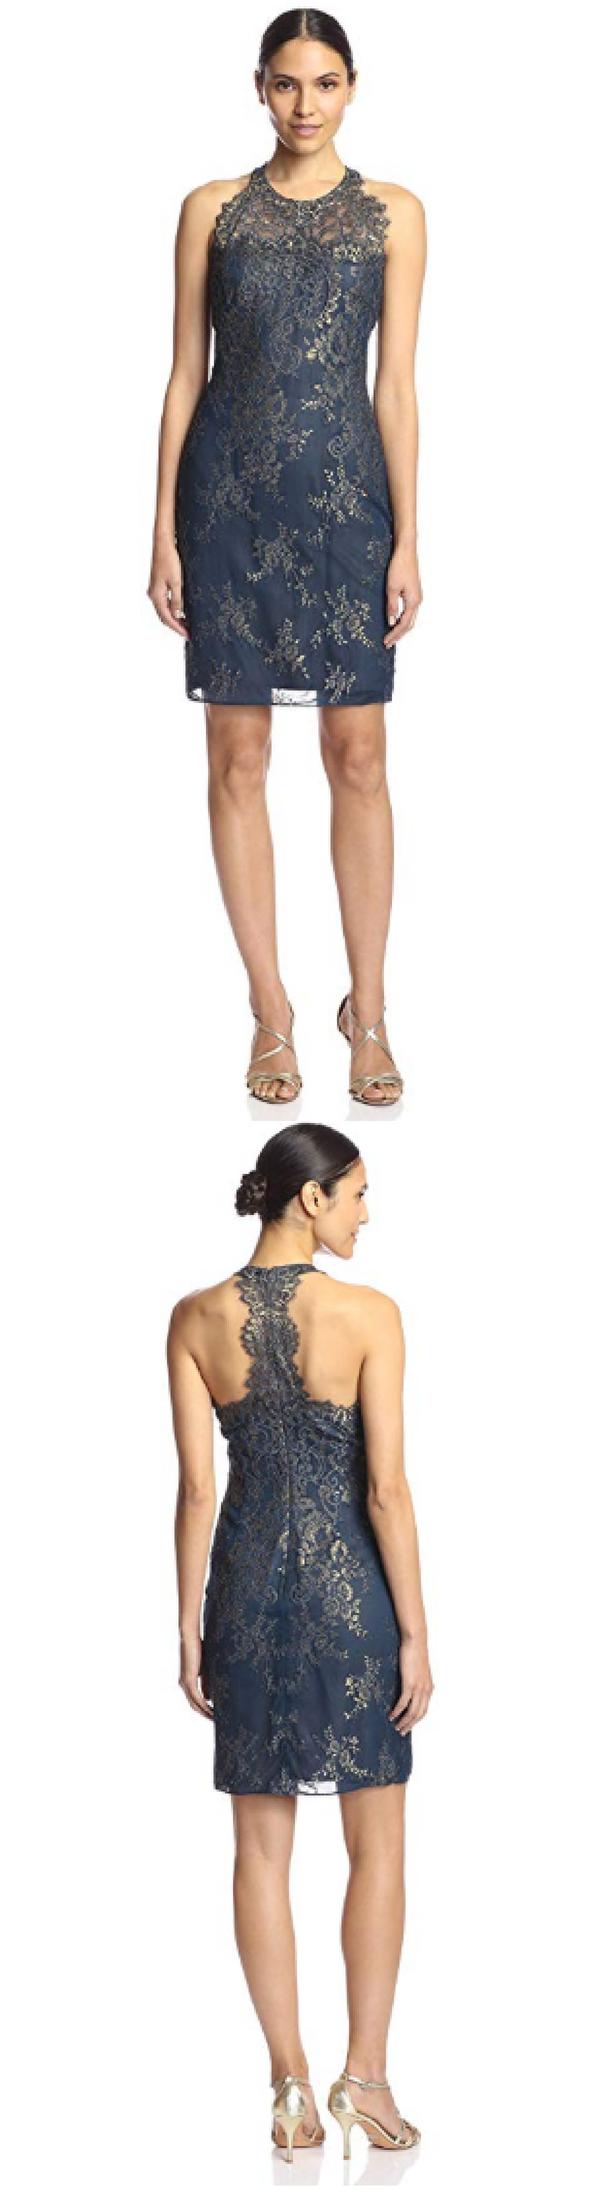 Marchesa notte womenus metallic lace cocktail dress teal dress